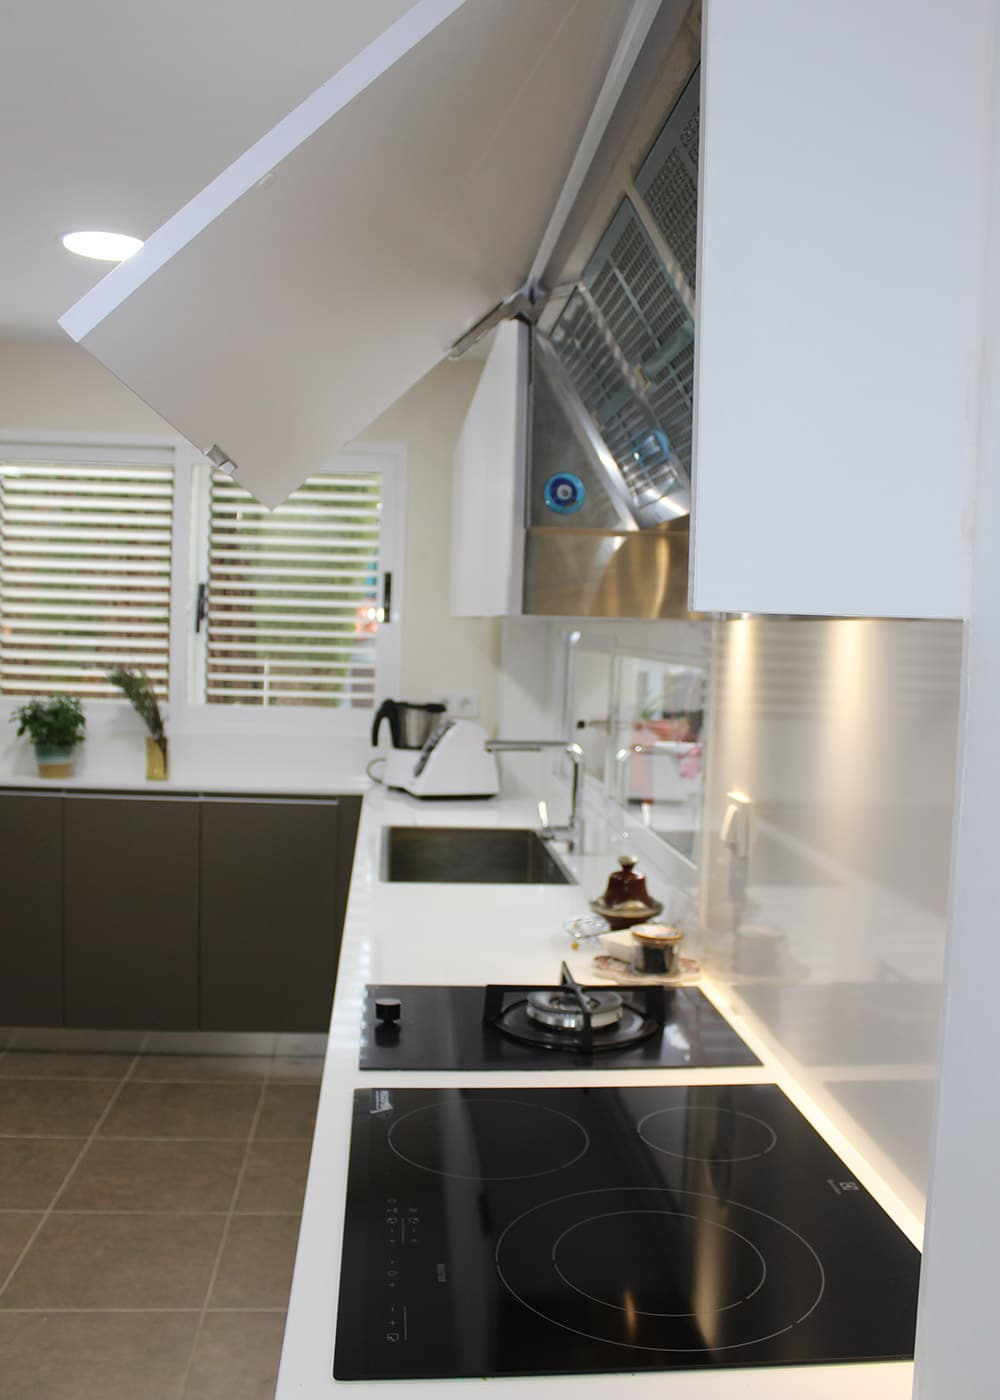 Detalle de mueble alto de cocina con campana integrada